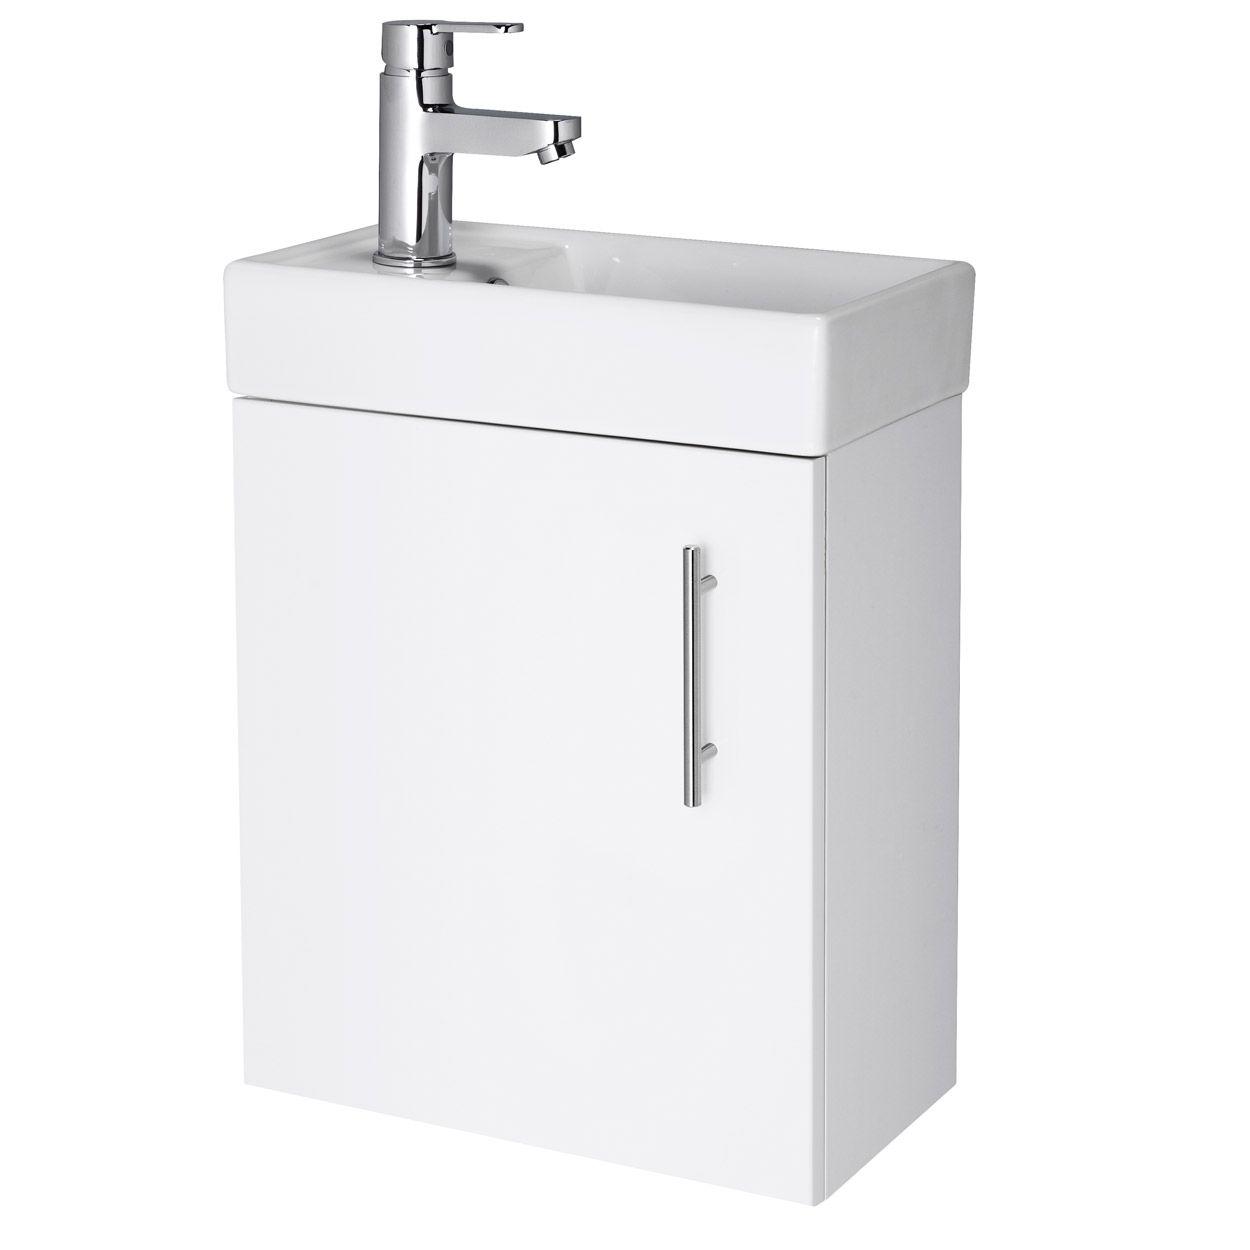 Premier Minimalist Compact Bathroom Vanity Unit U0026 Basin 400mm Wide White